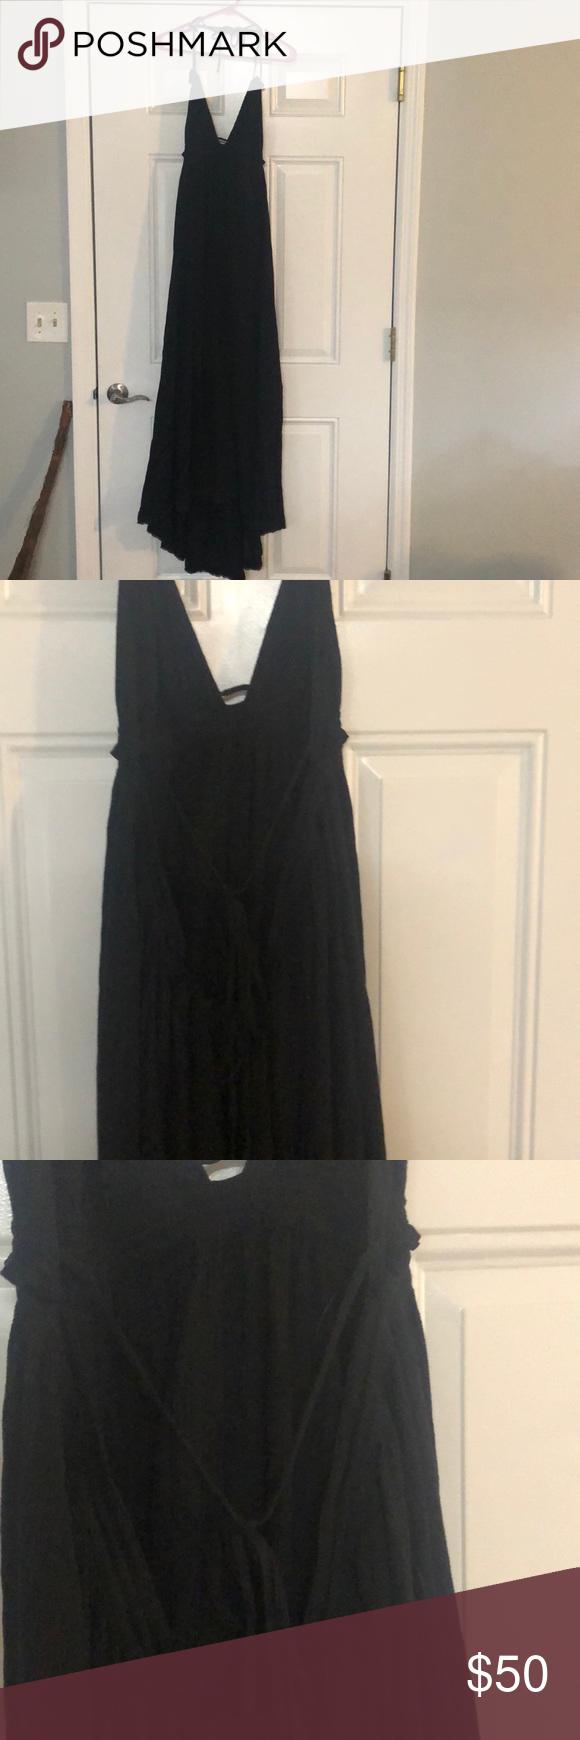 Victoria Secret Black Maxi Halter Beach Coverup Black Maxi Black Maxi Dress Victoria Secret [ 1740 x 580 Pixel ]